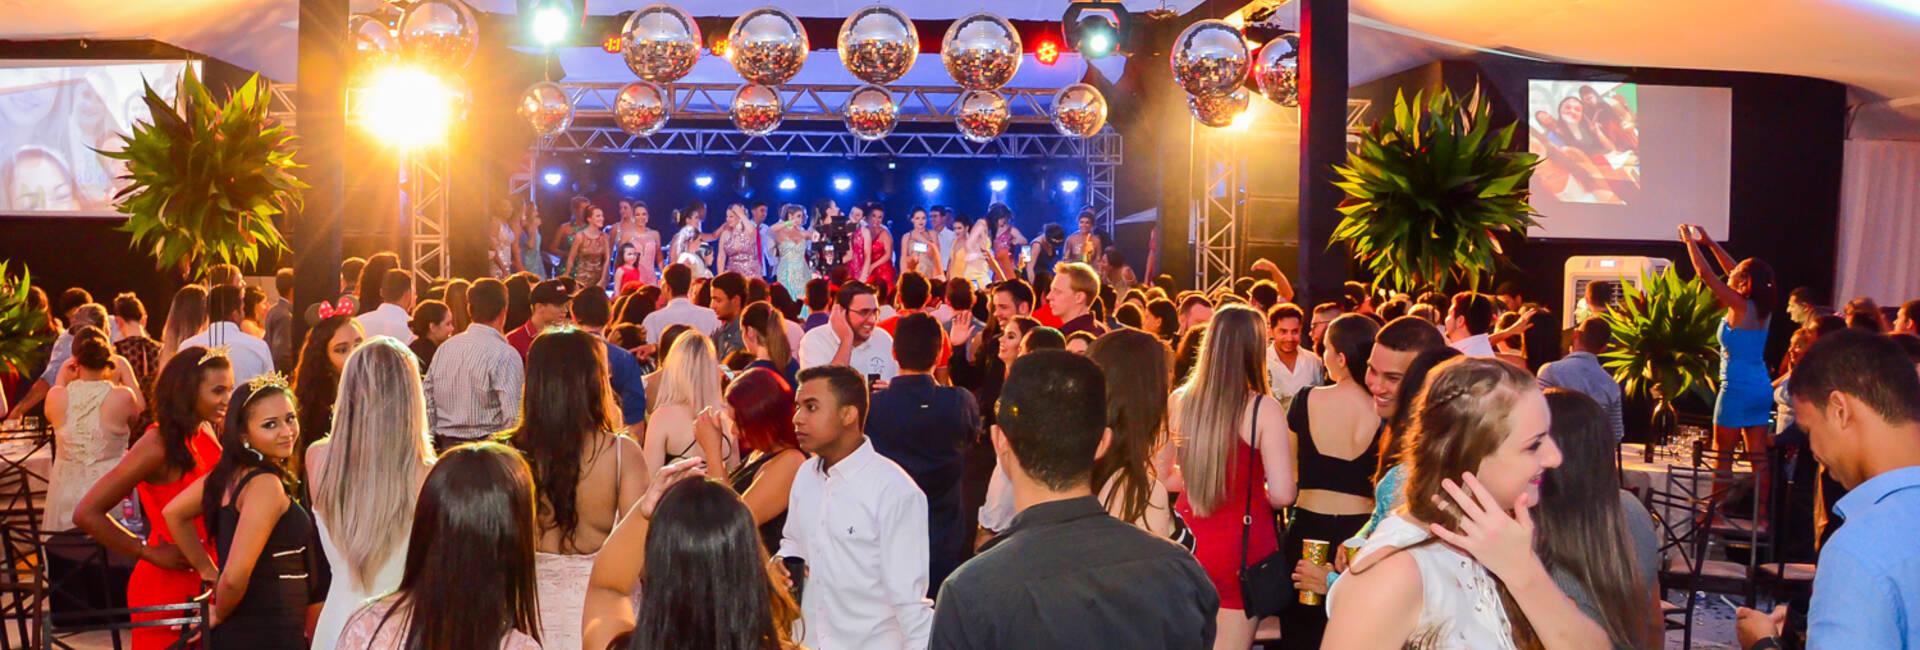 Baile de Gala de Turma Ciências Contábeis Uniflor